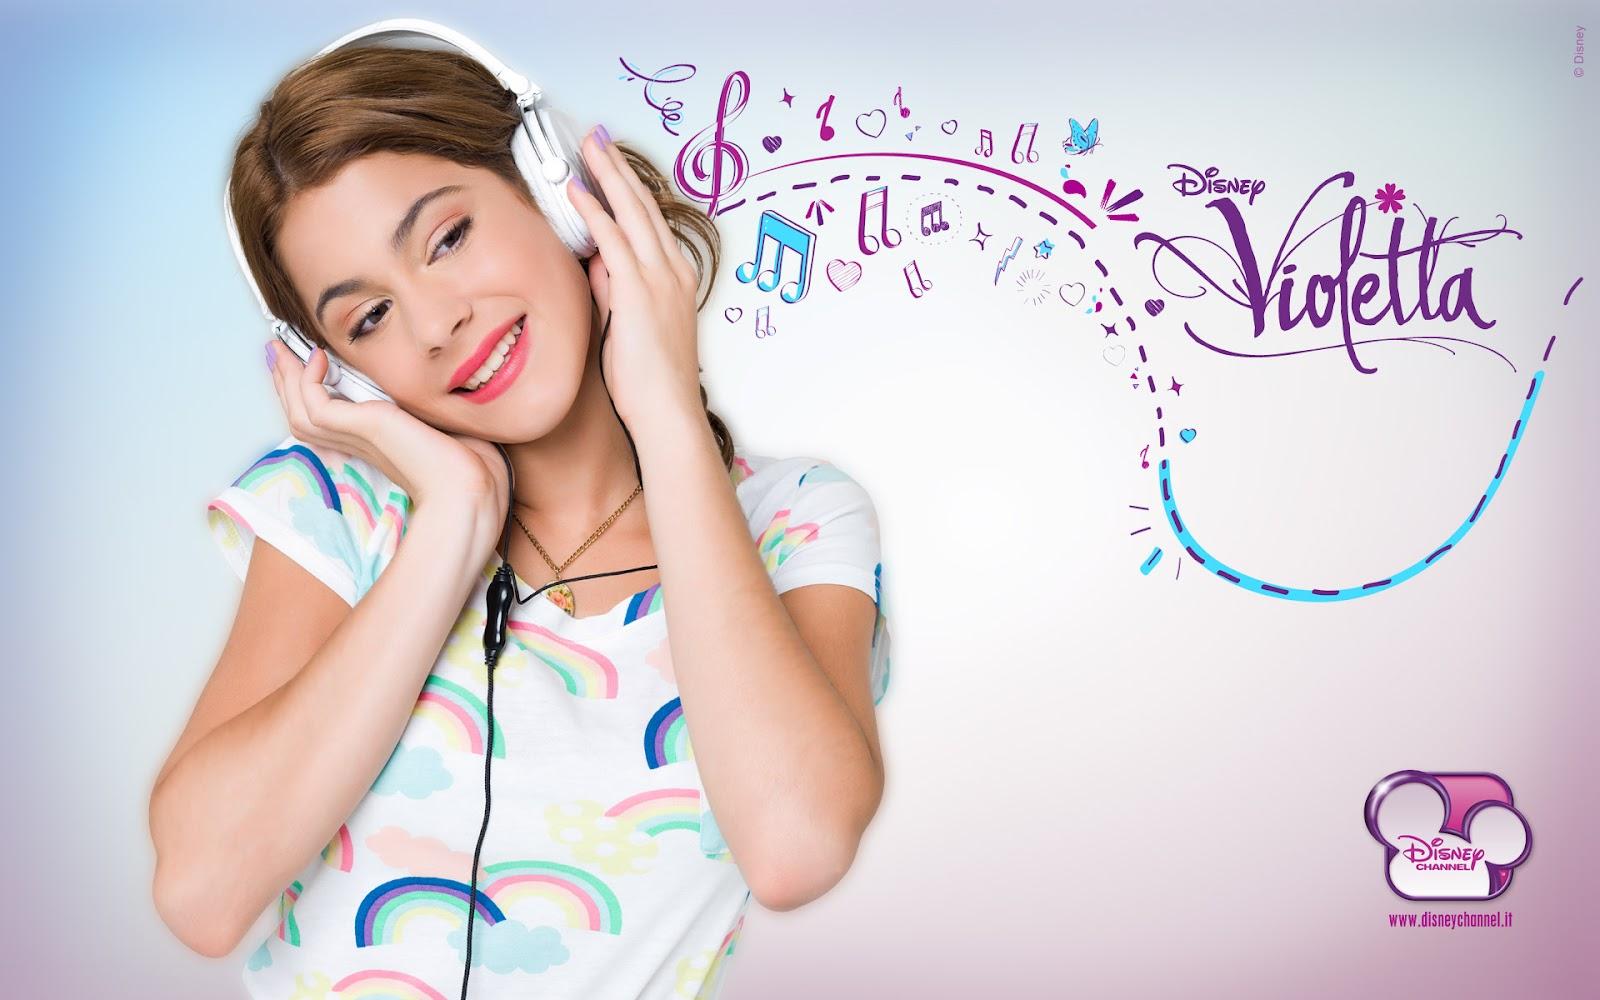 Jimena S Blog Violetta La Nueva Serie Disney Channel